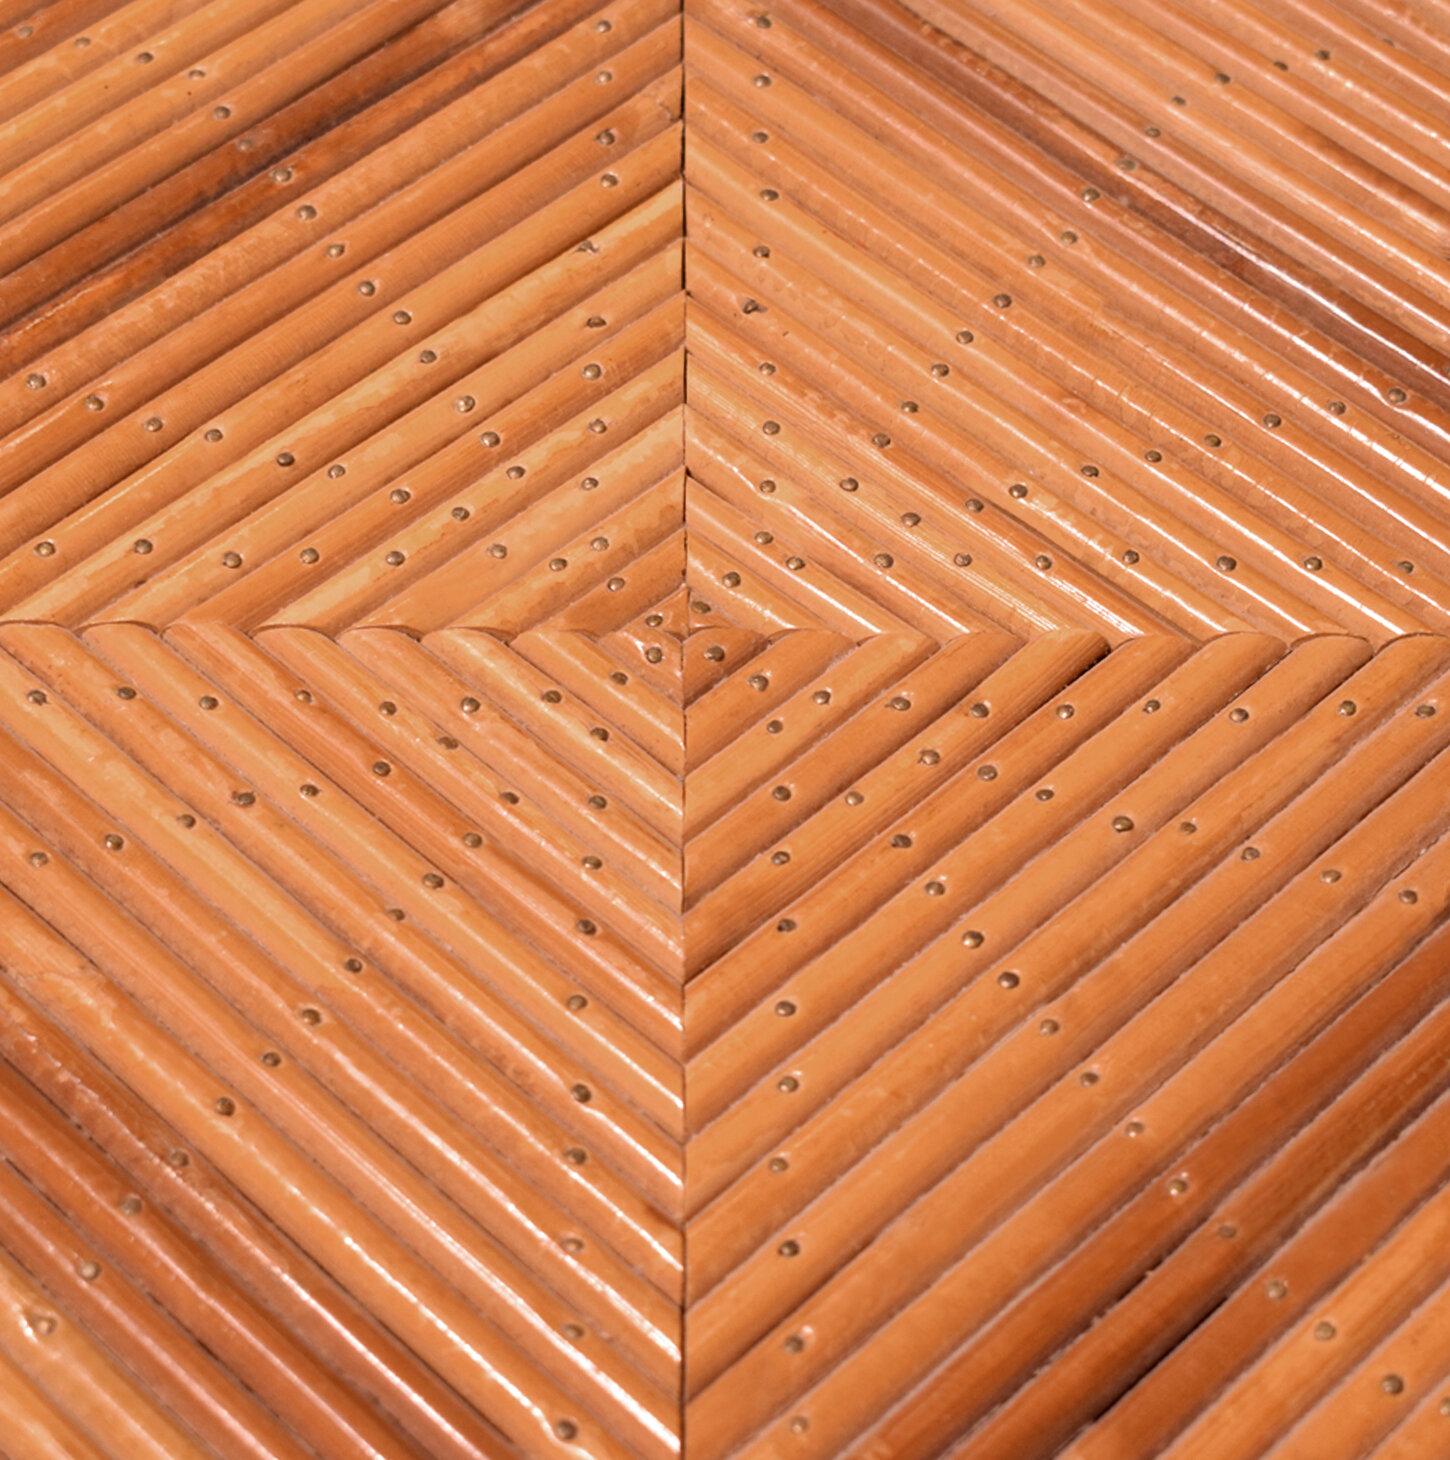 70s 120 trapezoidal bamboo chestofdrawers163 dtl.jpg